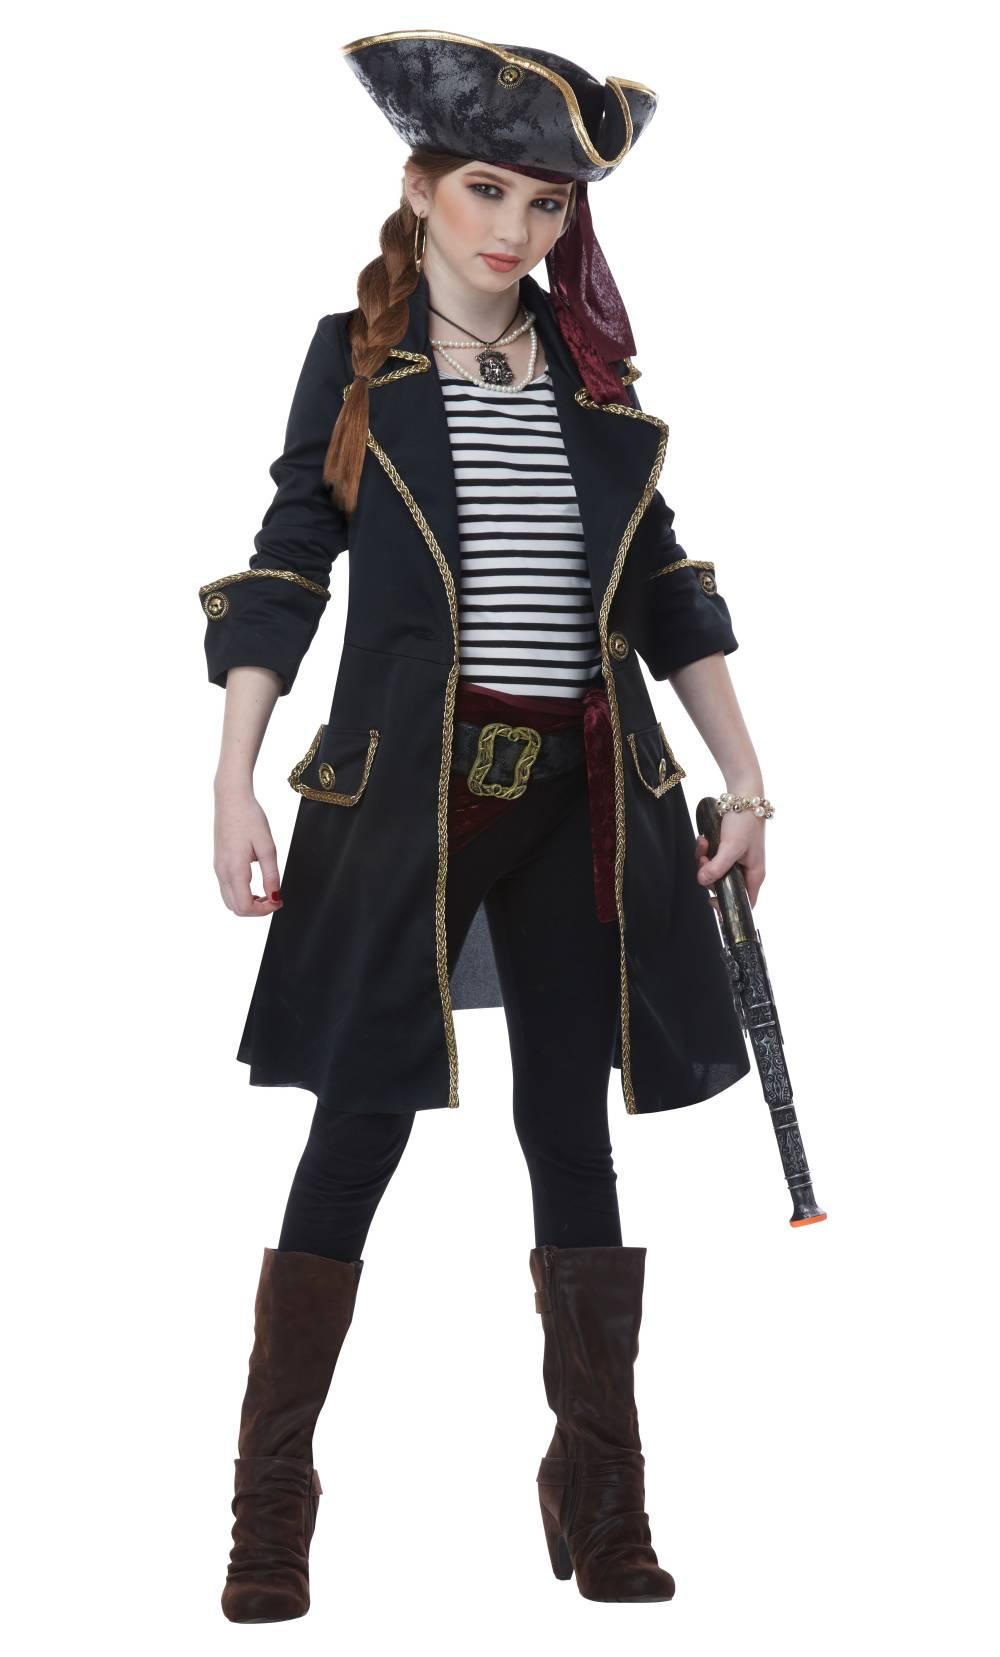 Costume-de-pirate-pour-fille-2